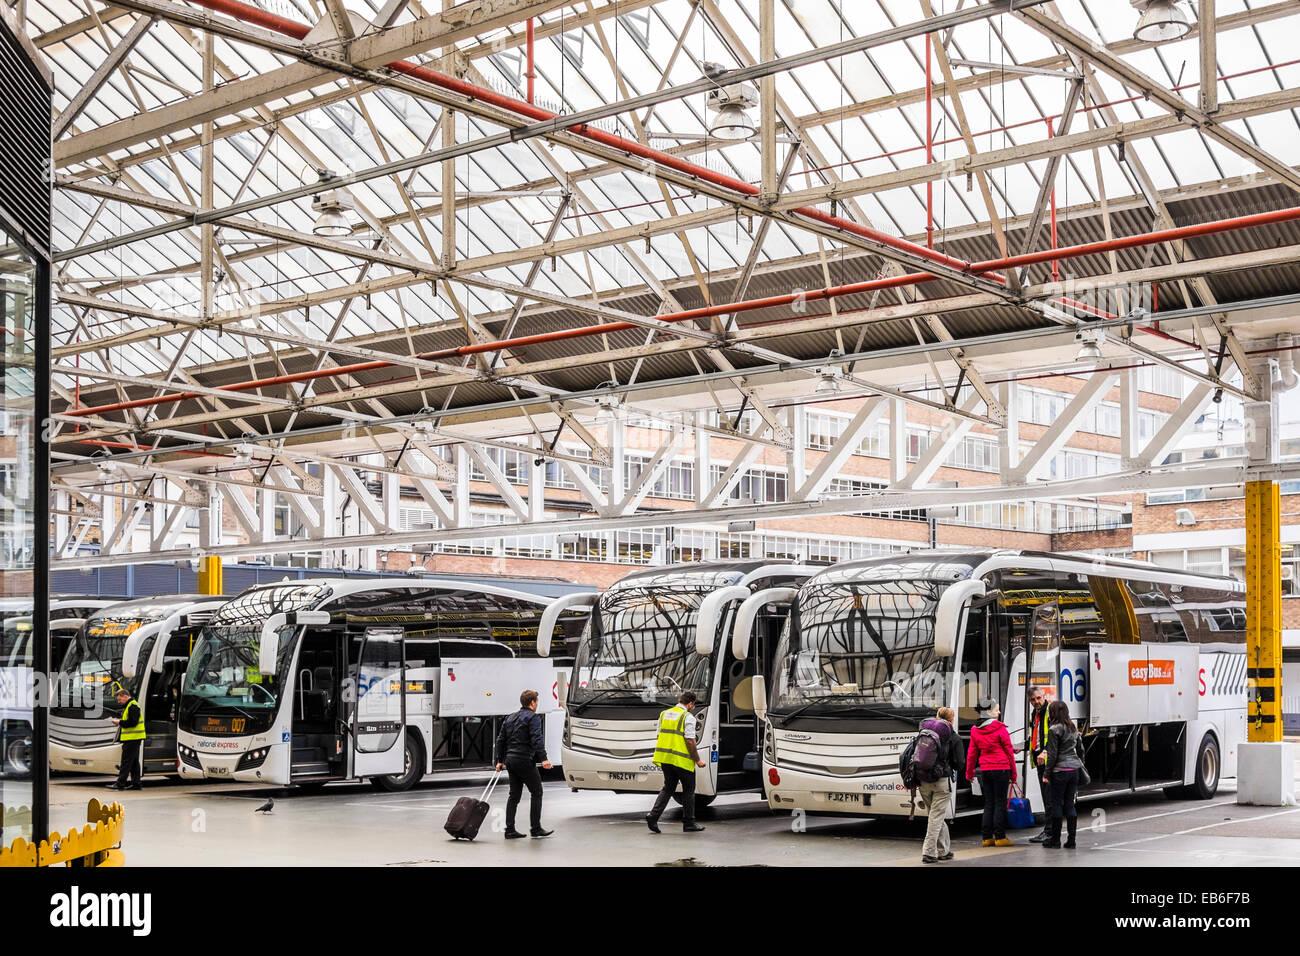 Victoria Coach Station - London - Stock Image